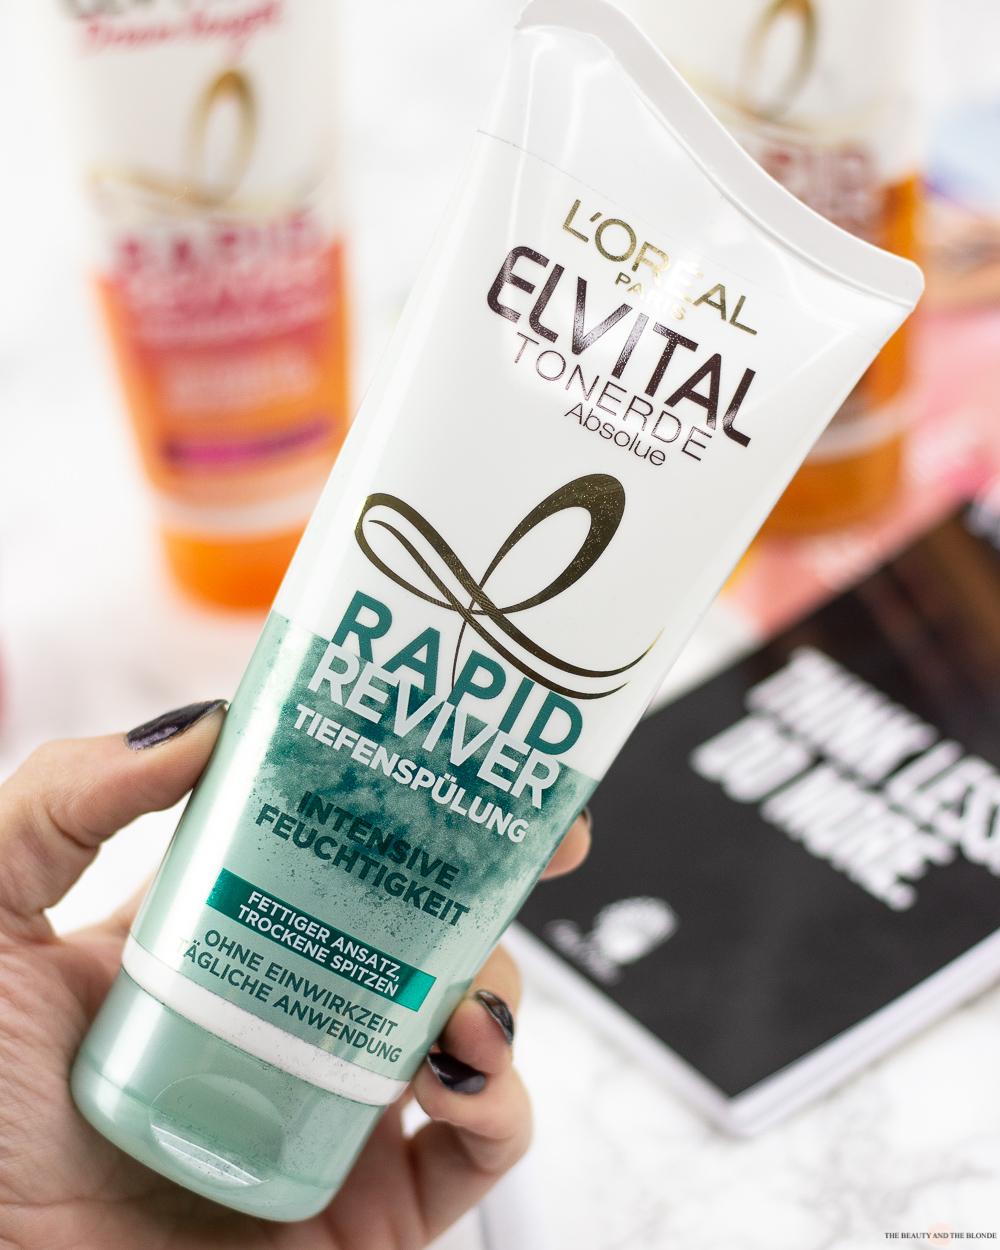 L'Oréal Elvital Rapid Reviver Tiefenspülung Conditioner Spülung Haarpflege Haare Drogerie